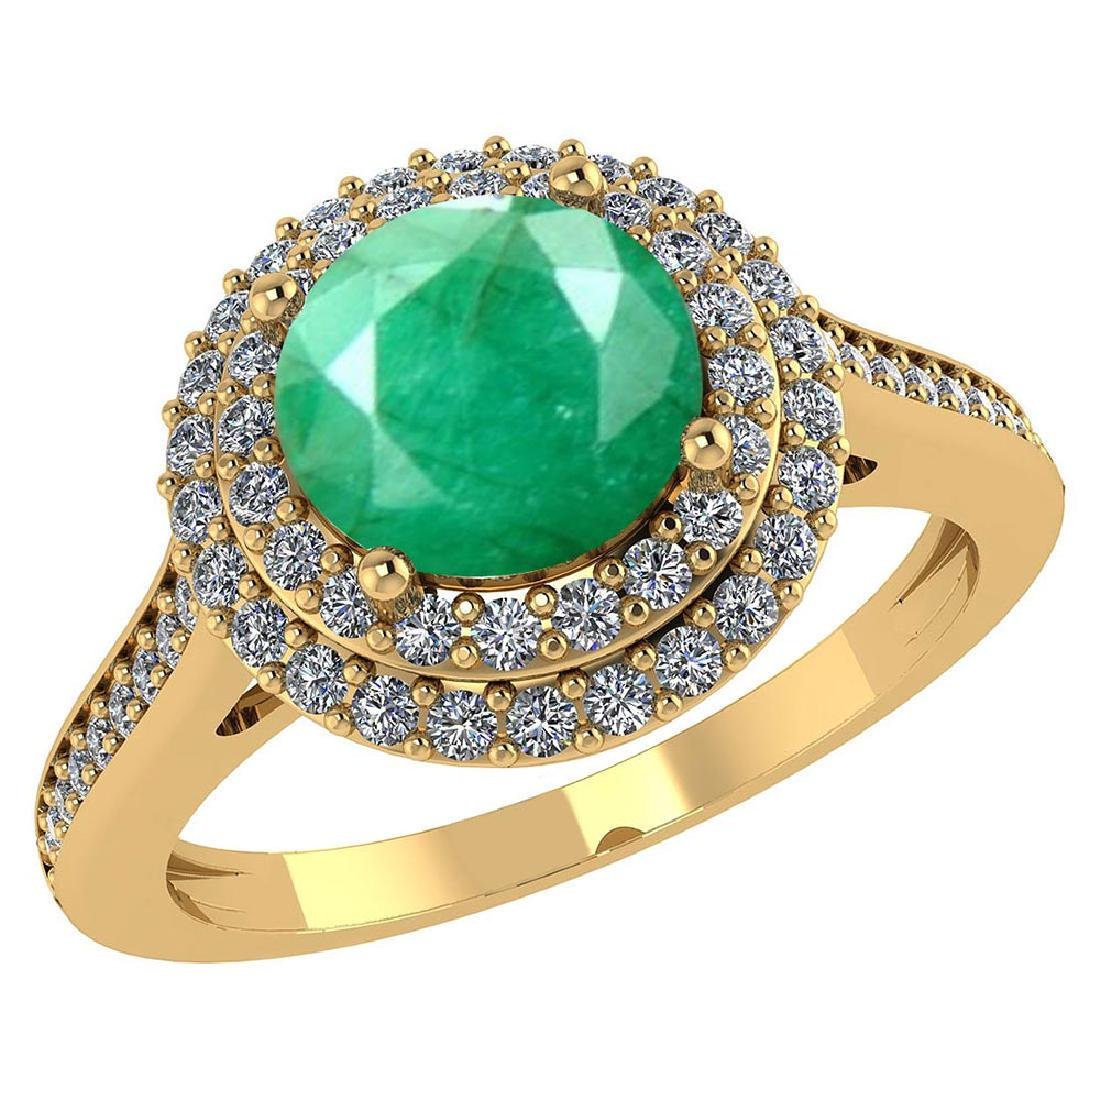 Certified 3.2 CTW Genuine Emerald And Diamond 14K Yello